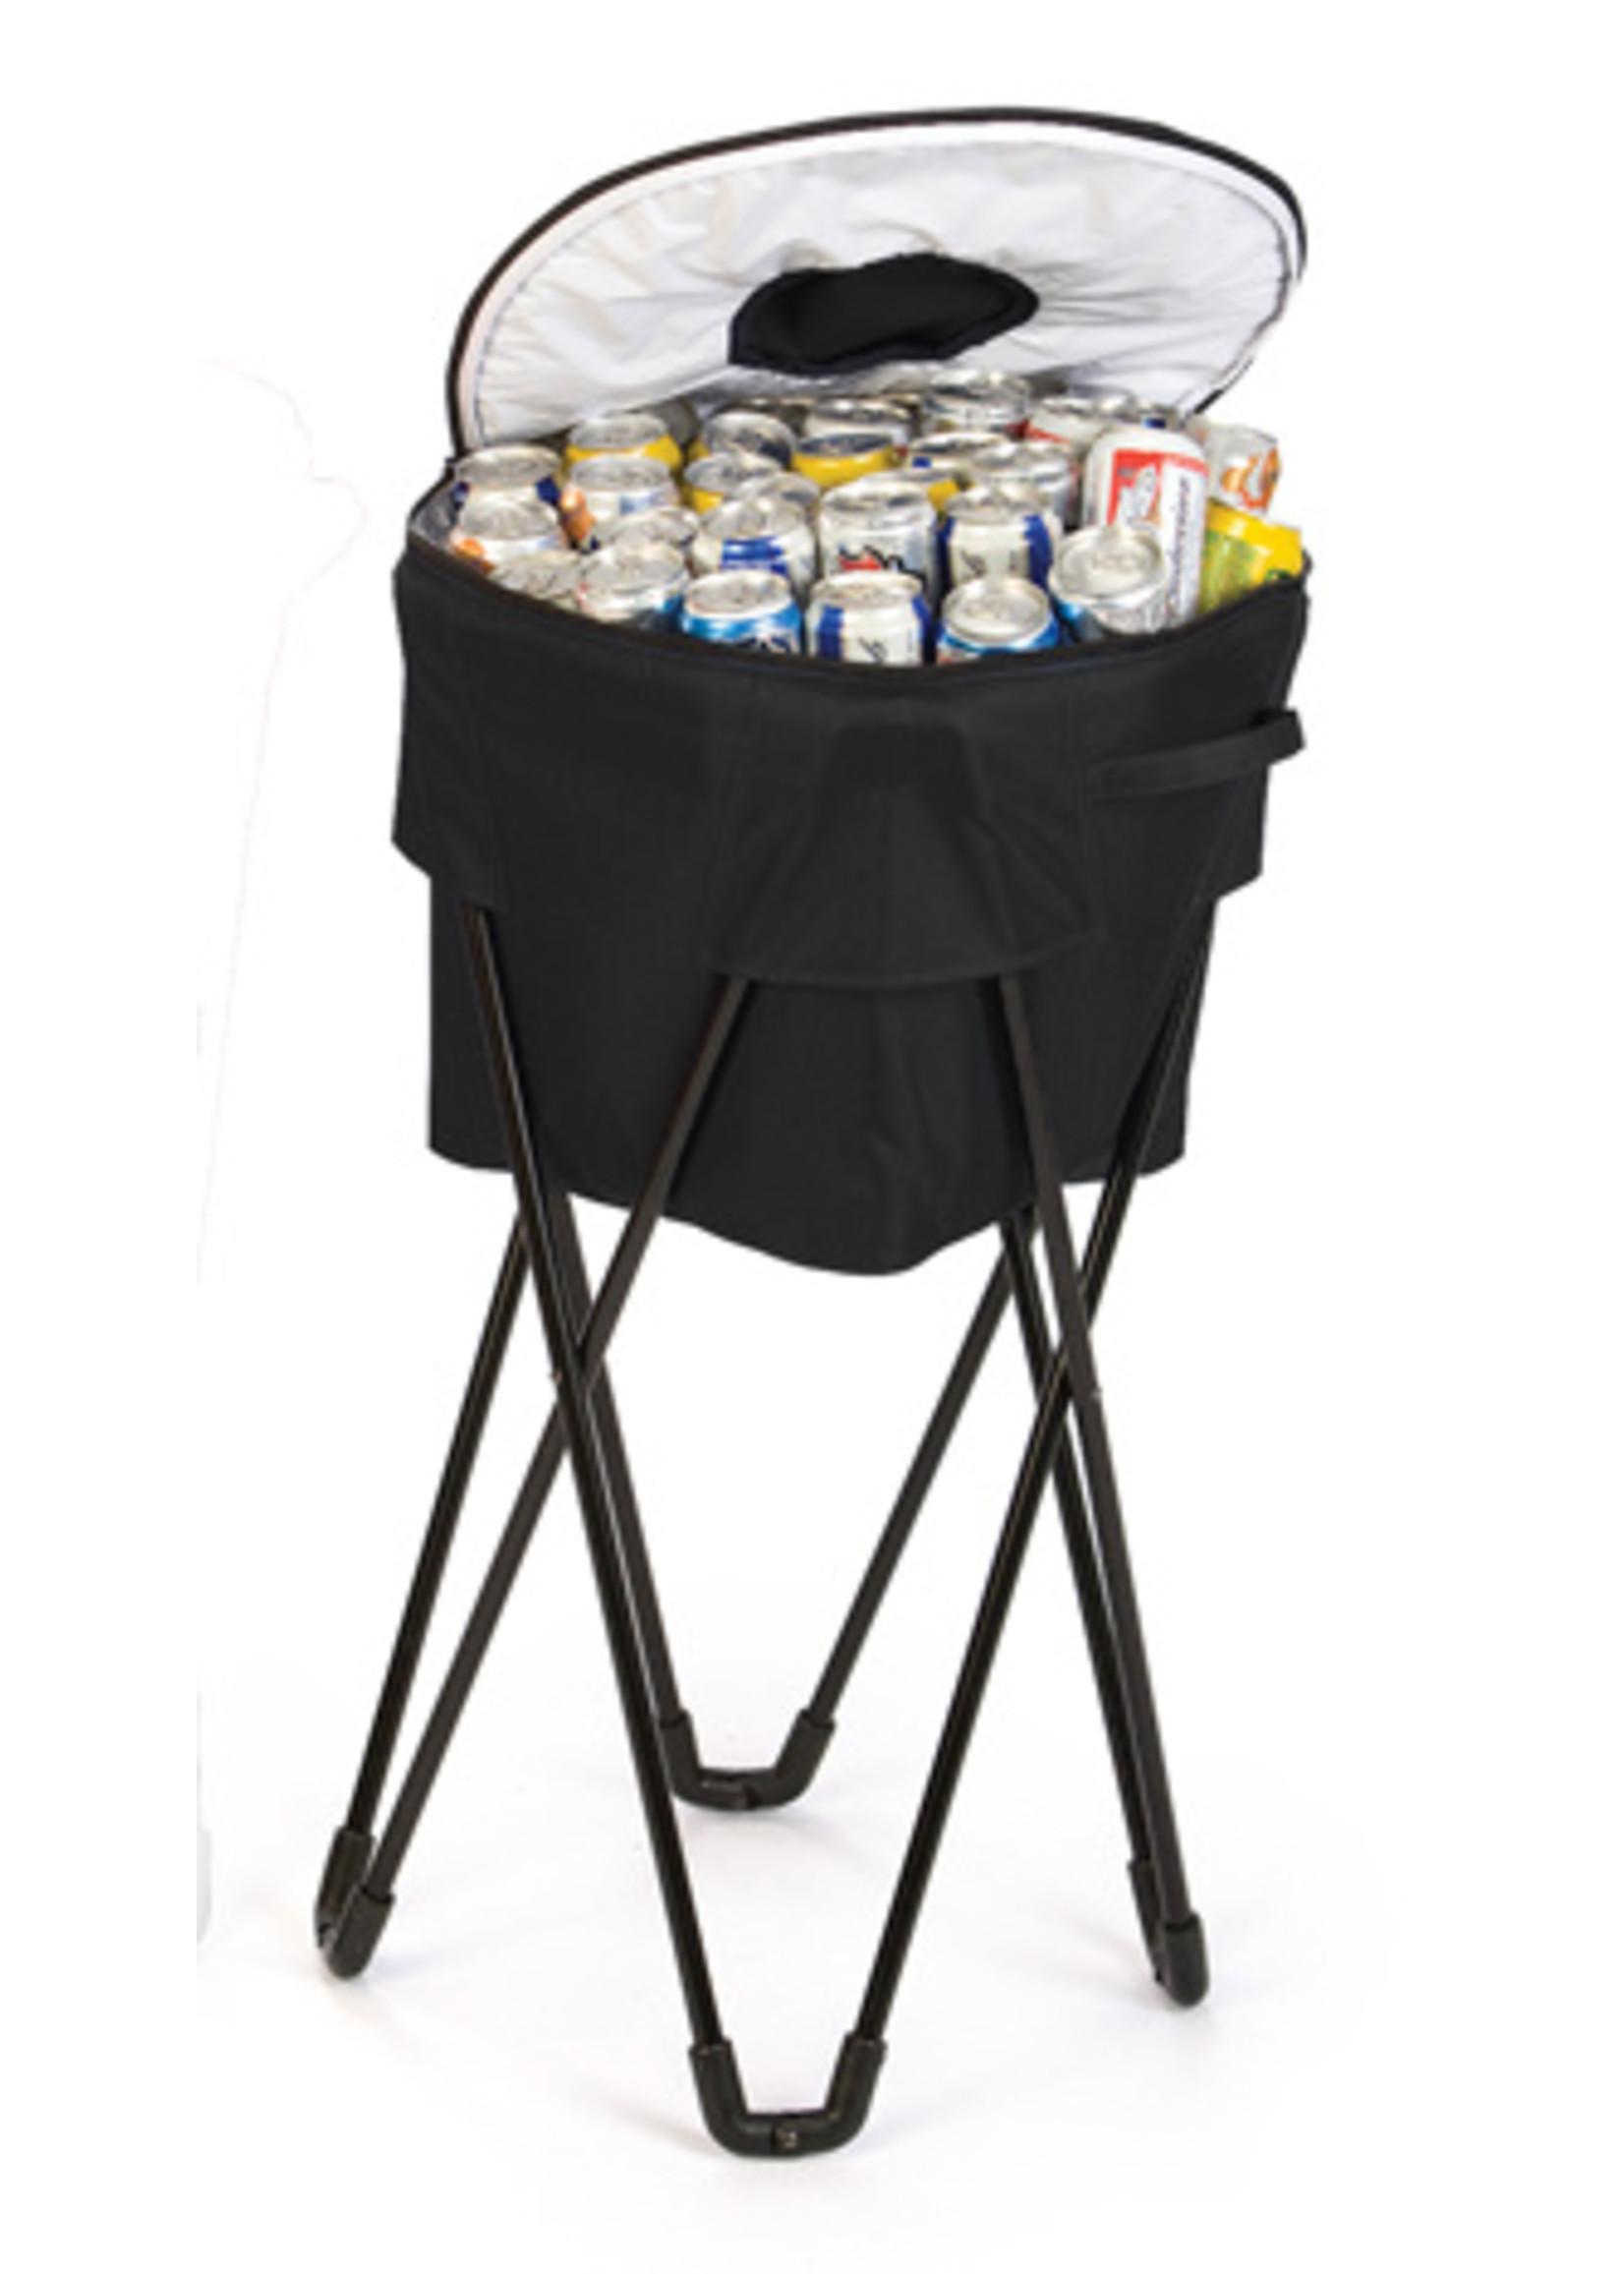 Oak & Olive/Picnic Plus Tub Cooler - Black